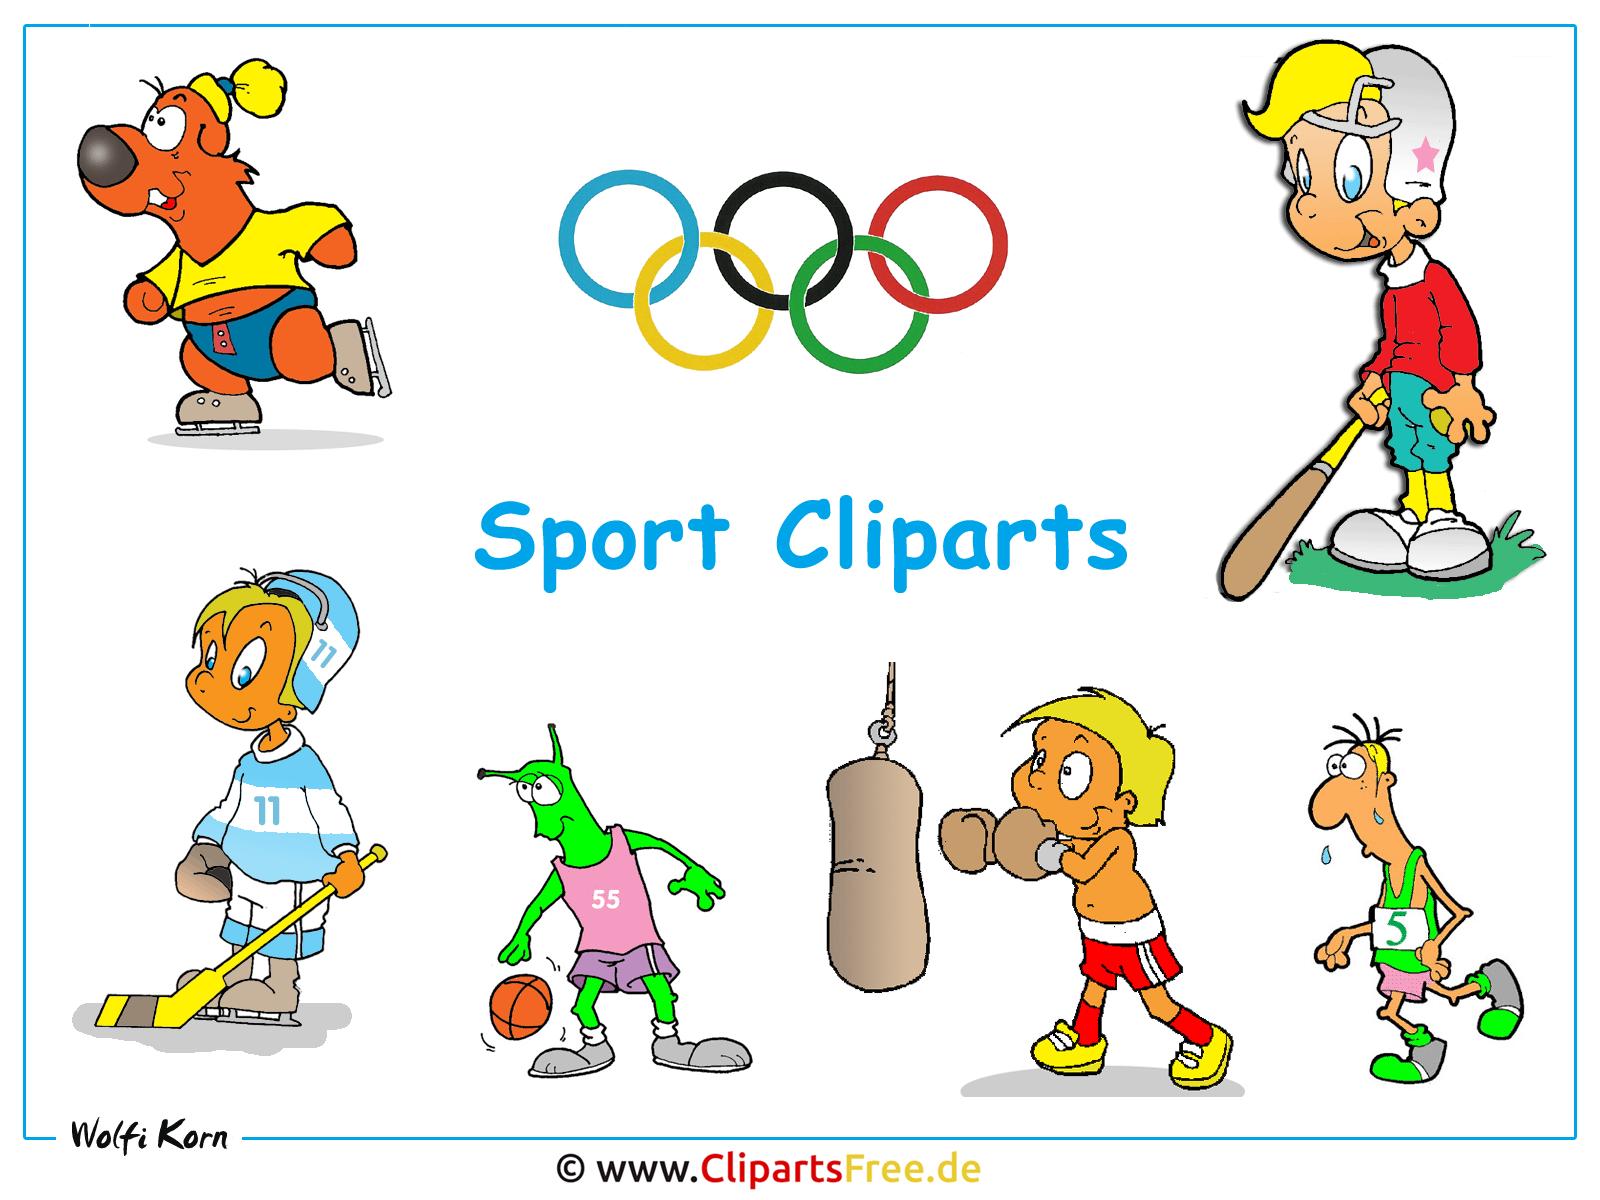 Sport Cliparts kostenlos - Desktop Bild